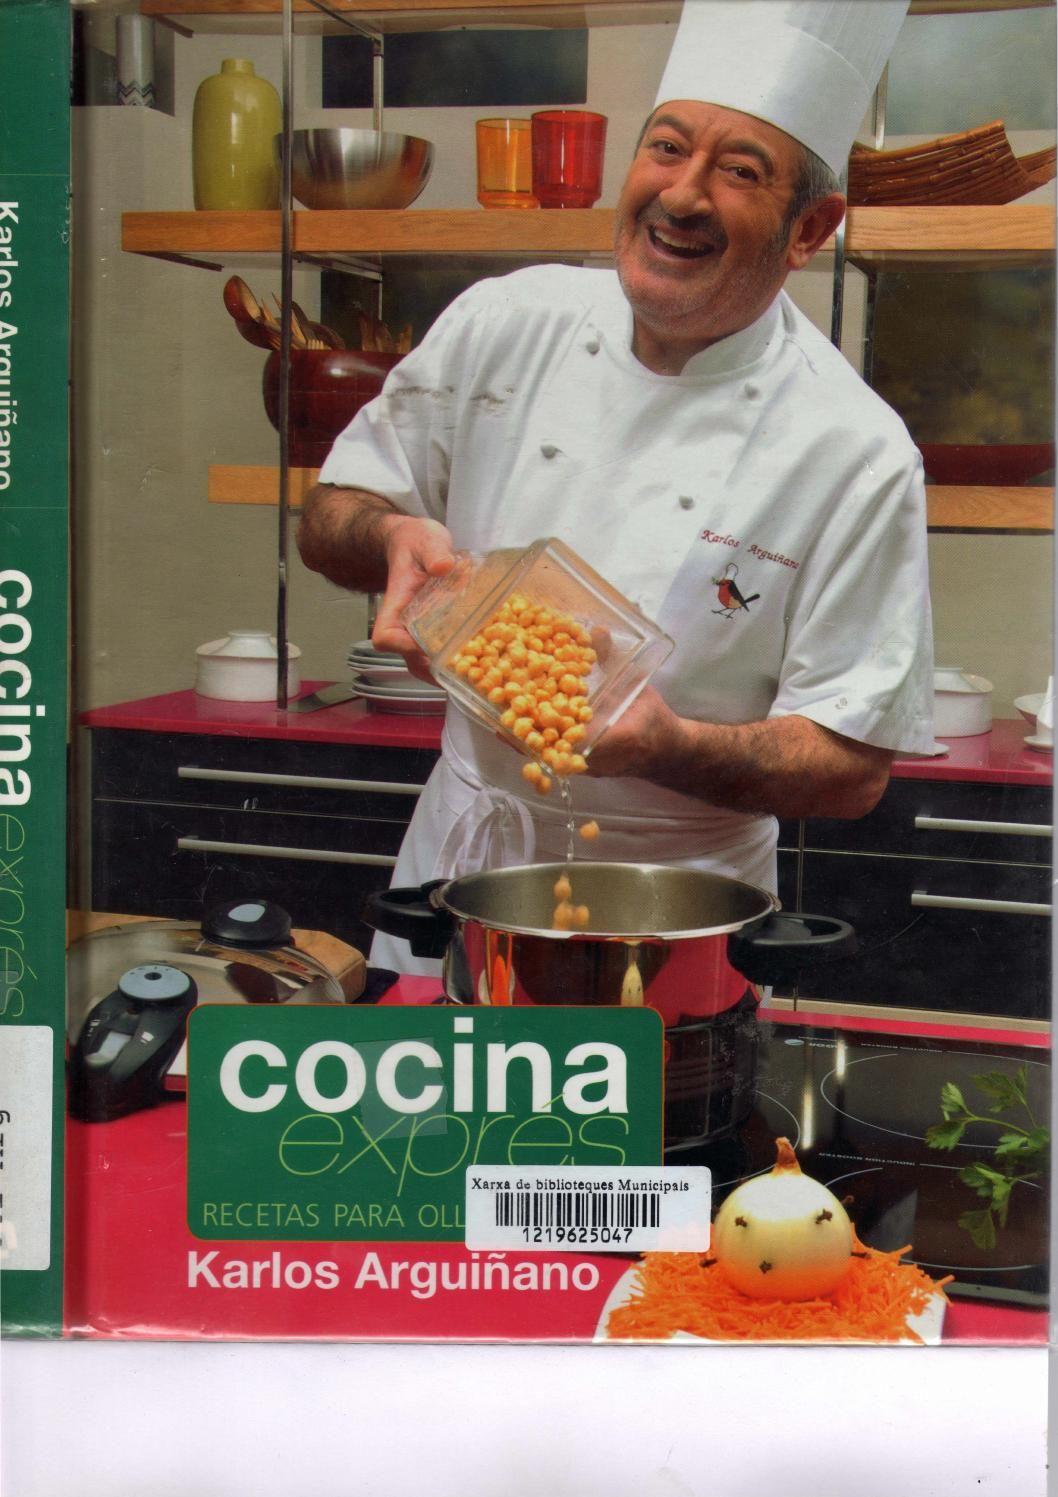 Karlos Arguiñano En Tu Cocina Recetas | Cocina Expres Recetas Para Olla A Presion De Karlos Arguinano Sfrd